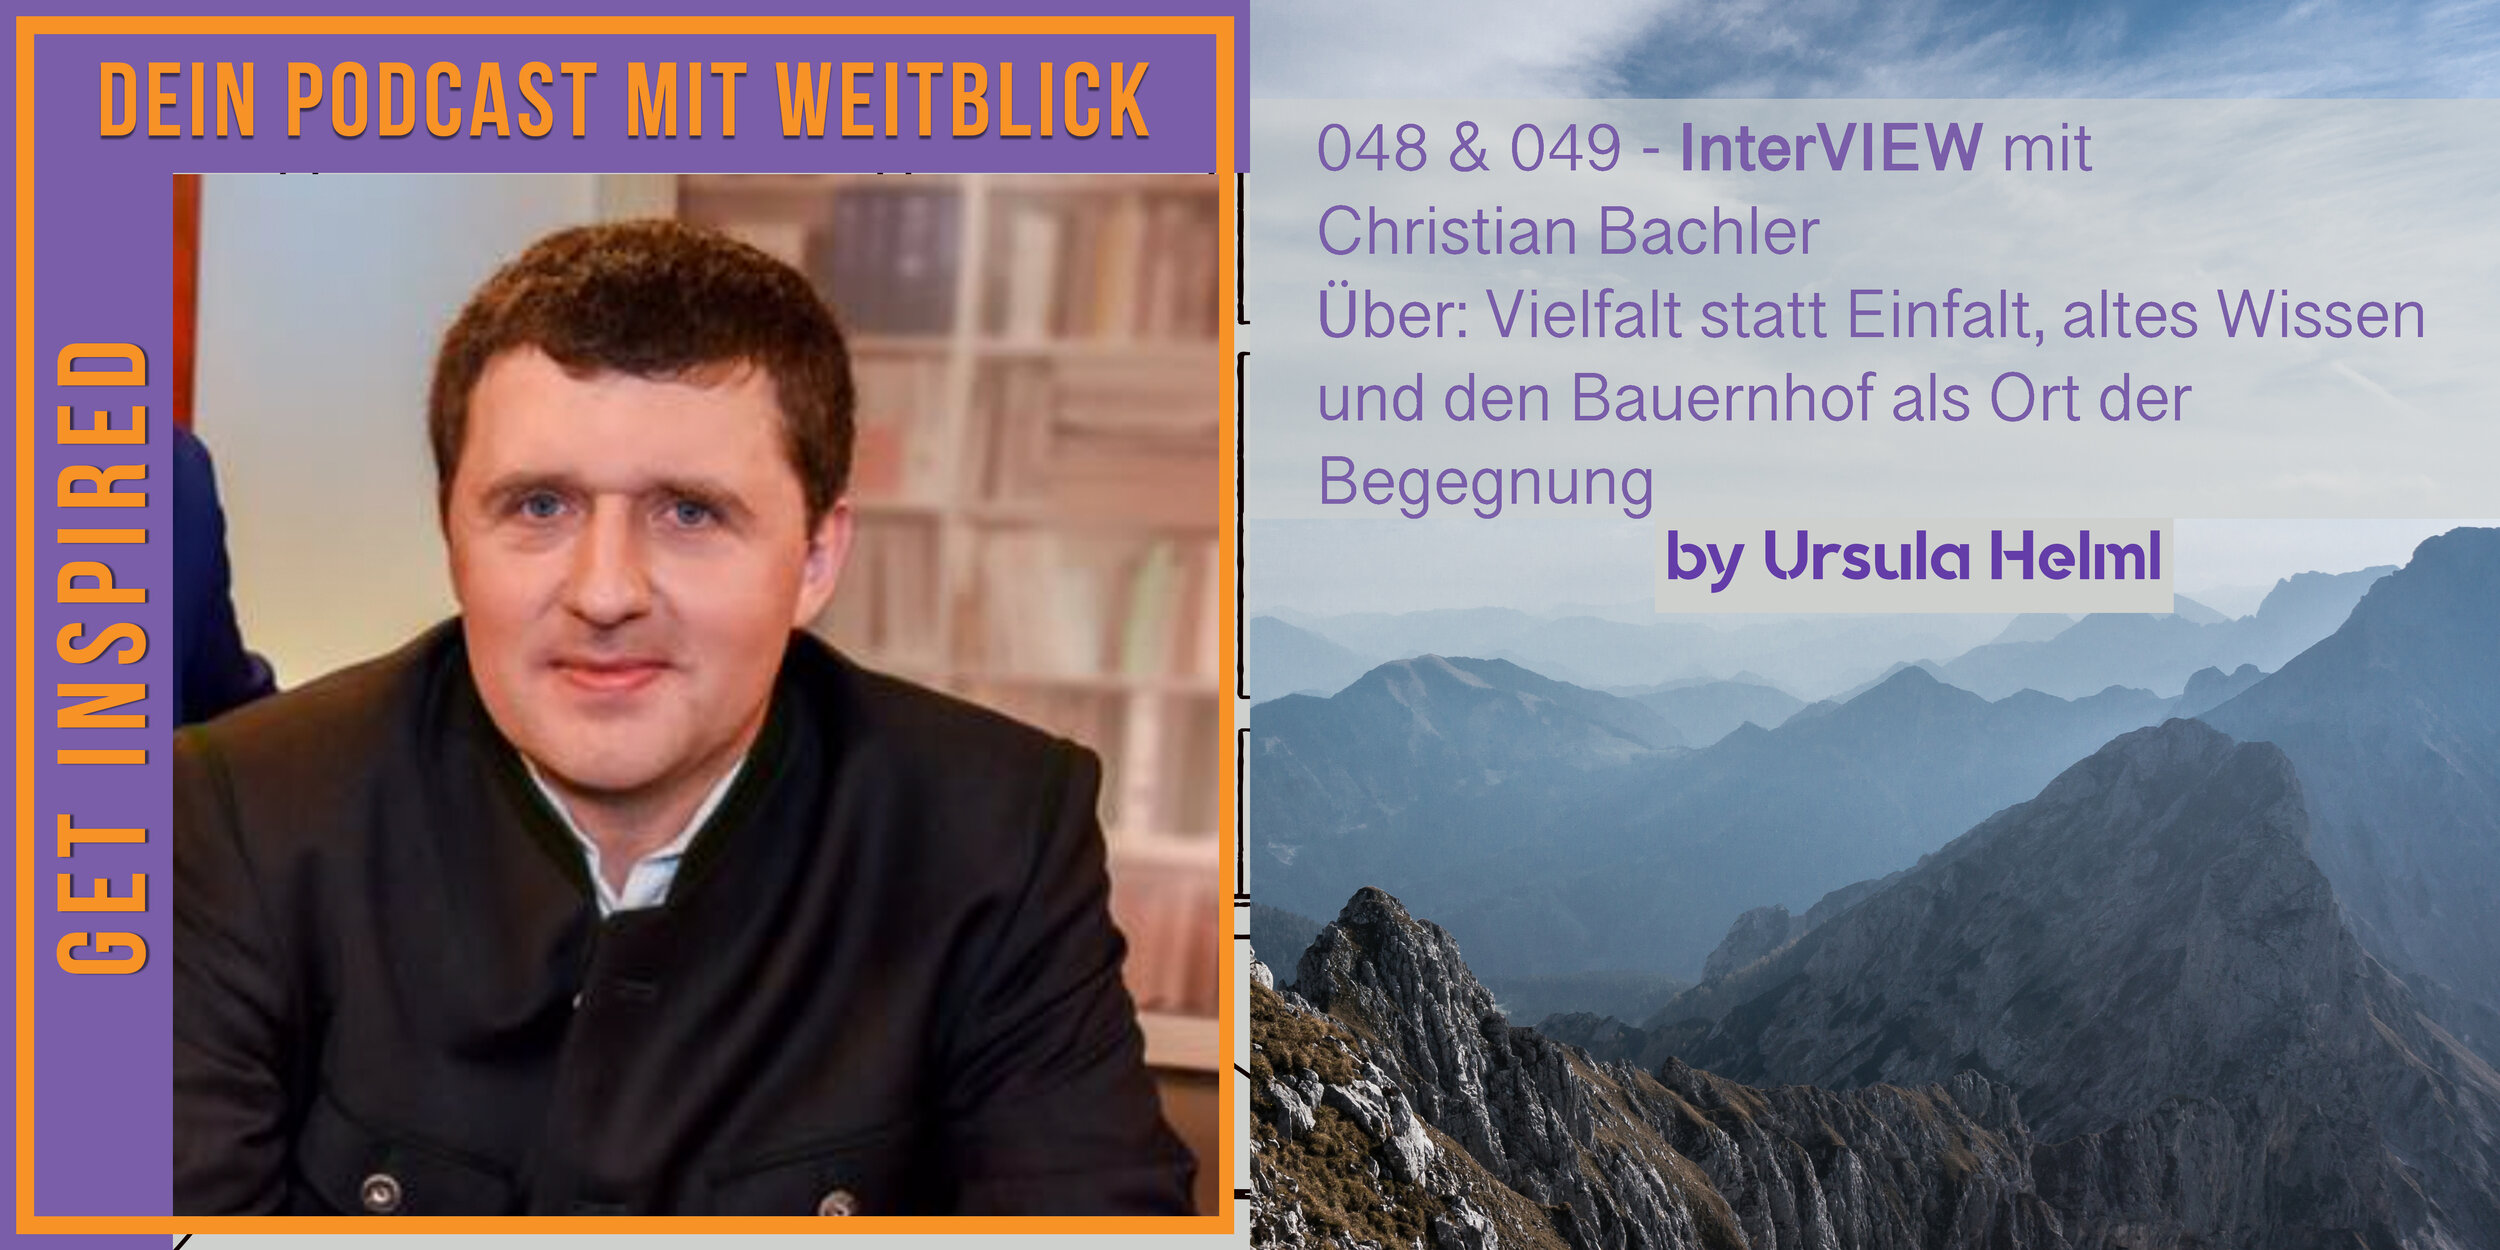 ChristianBachler.jpg